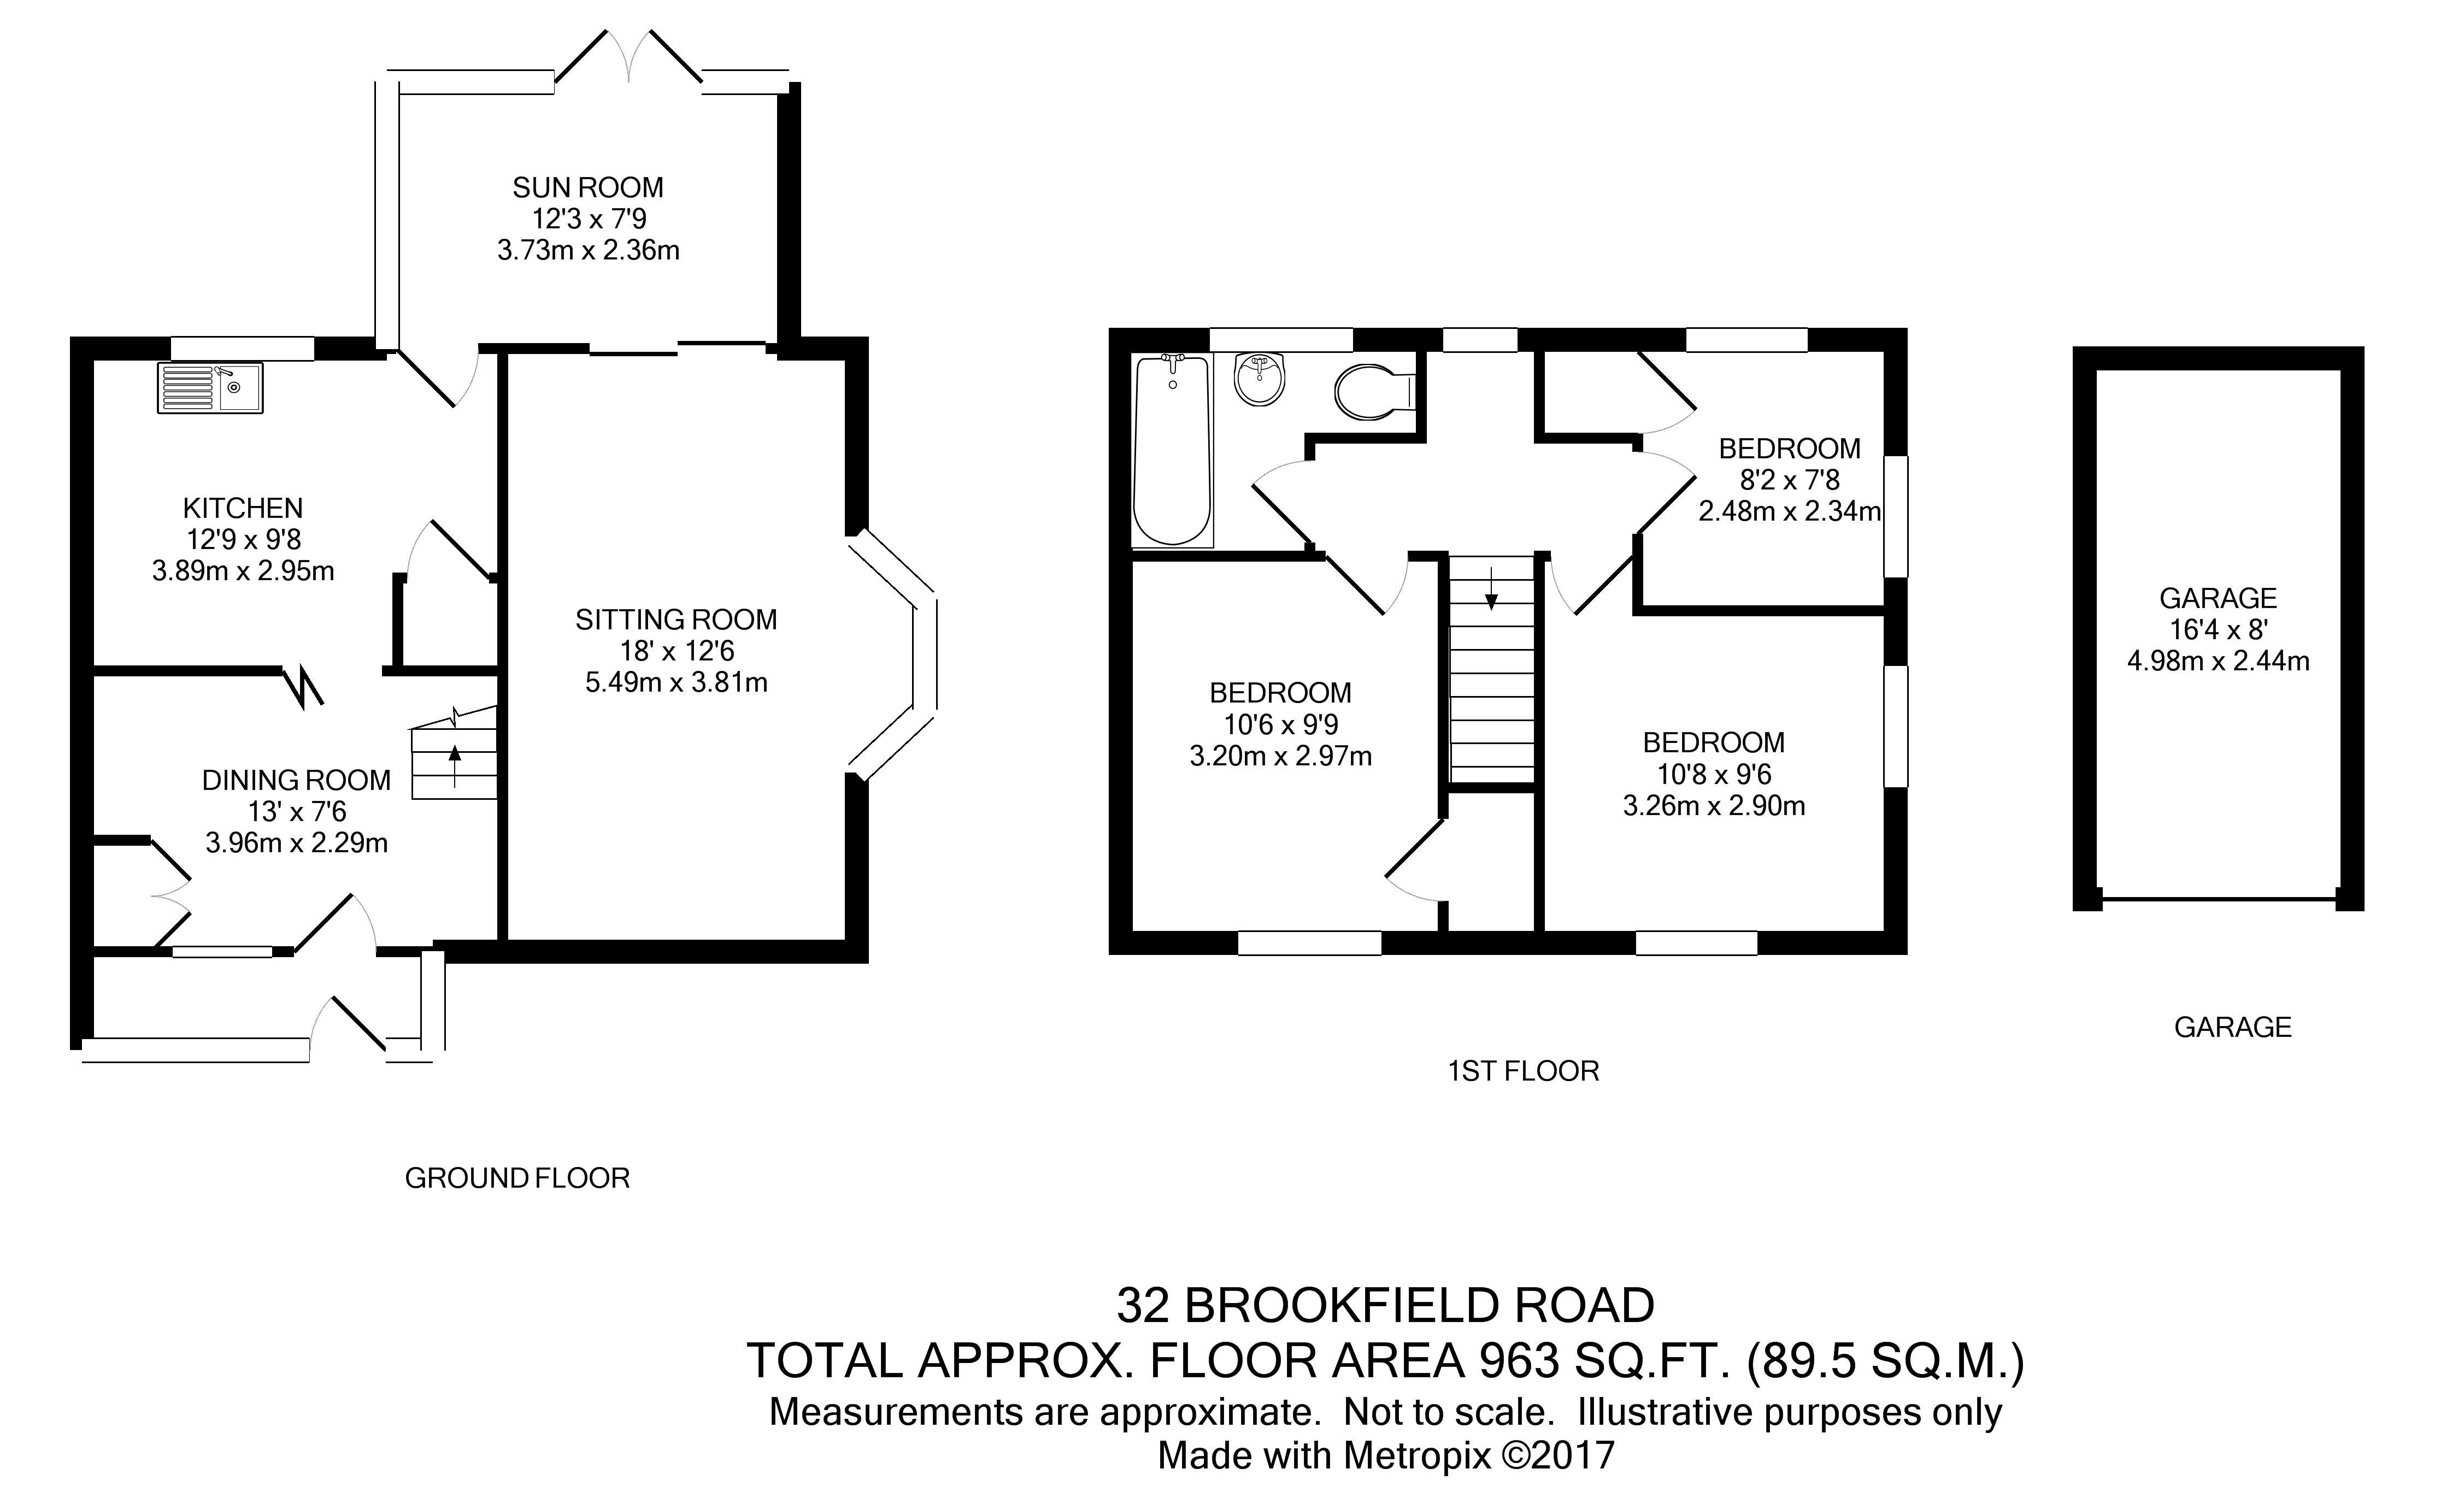 3 Bedroom House For Sale In Wolverhampton